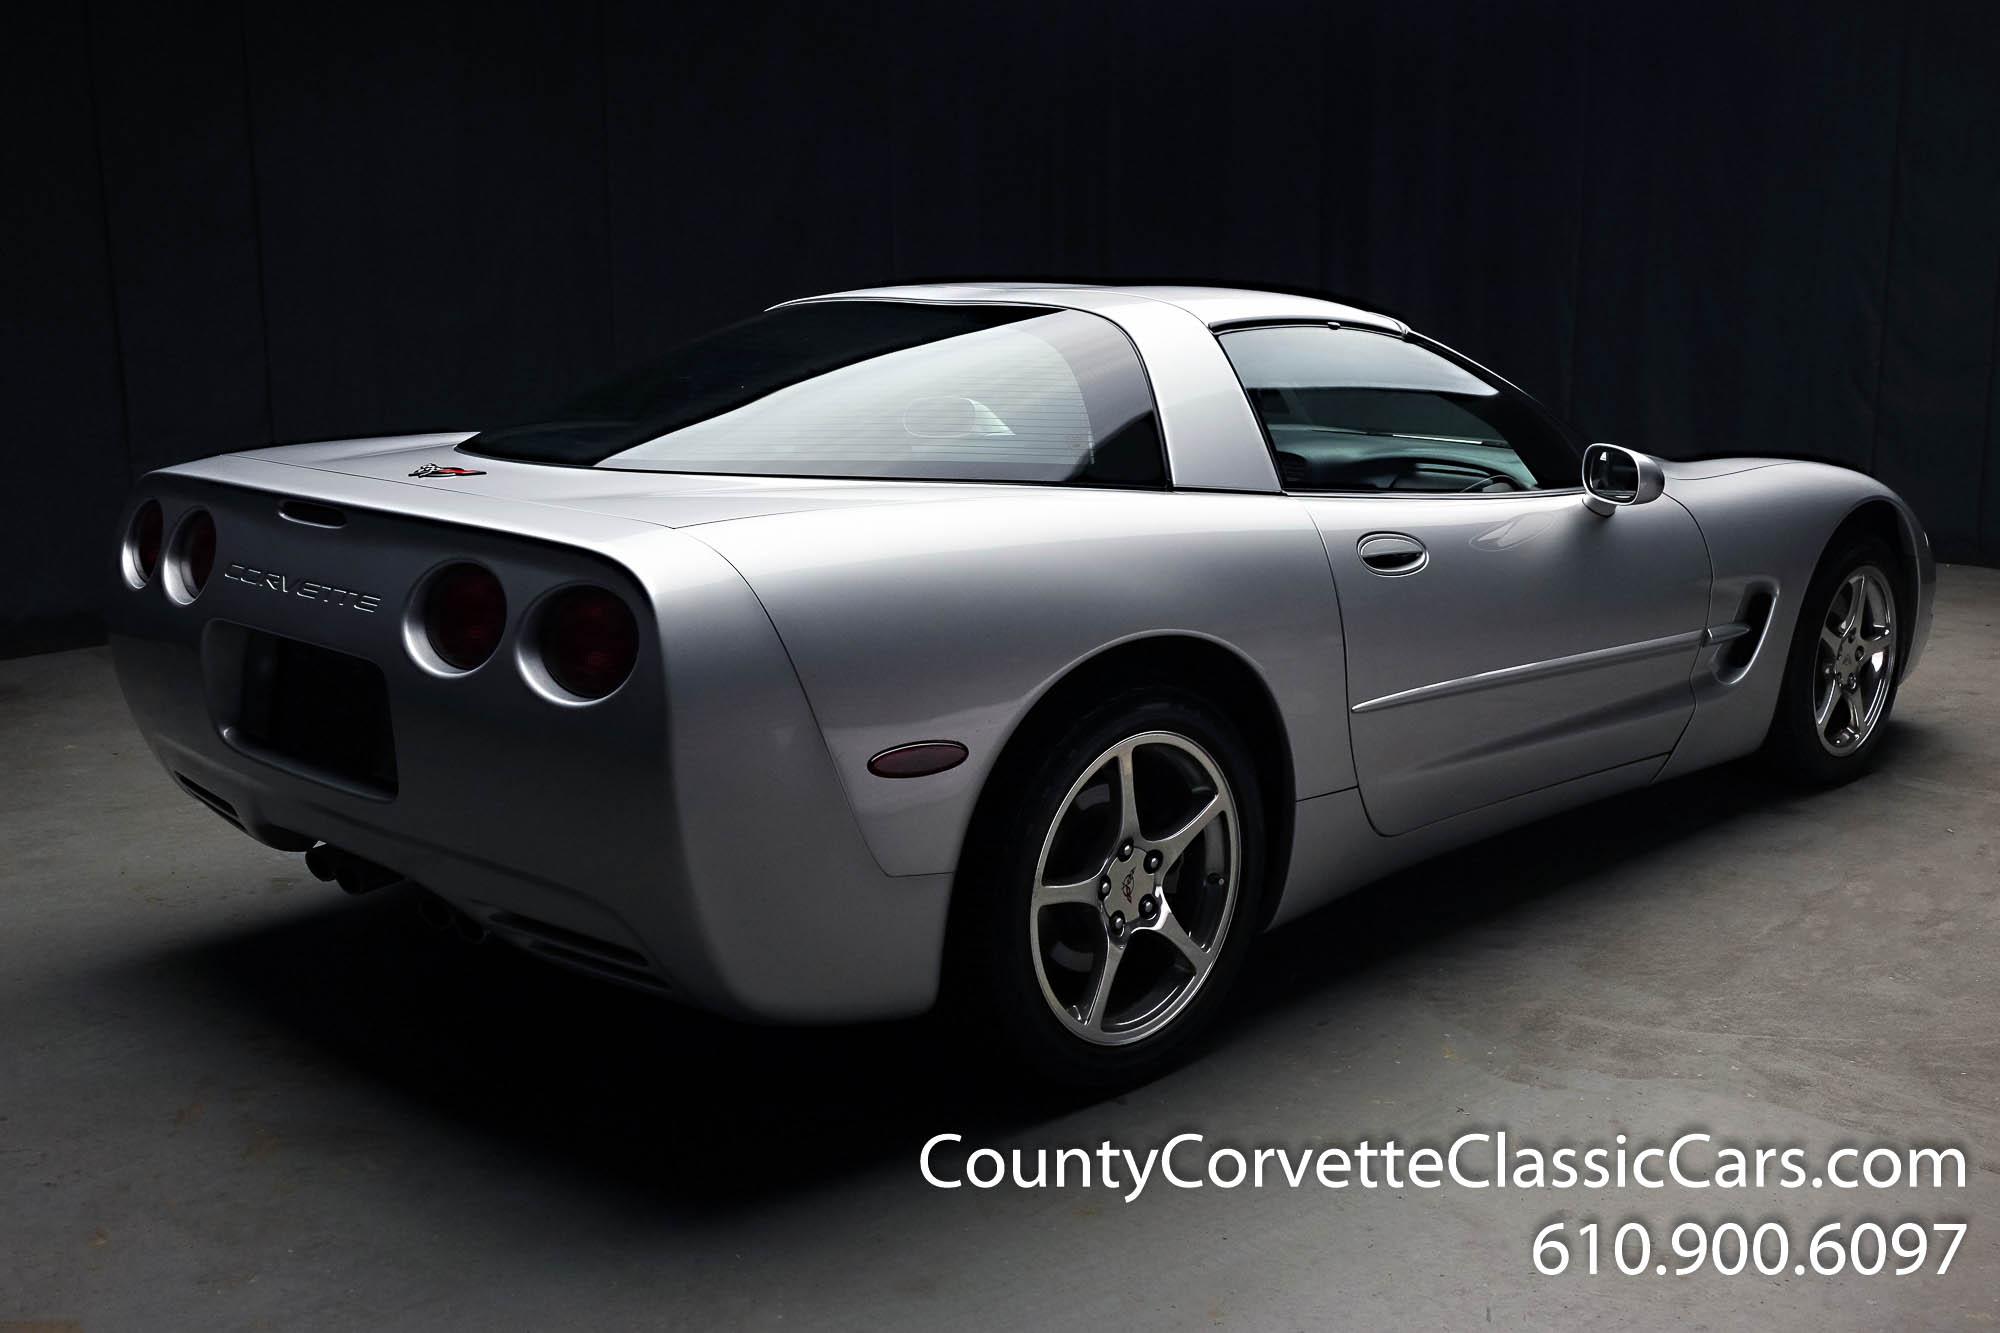 2002-Corvette-Coupe-27.jpg